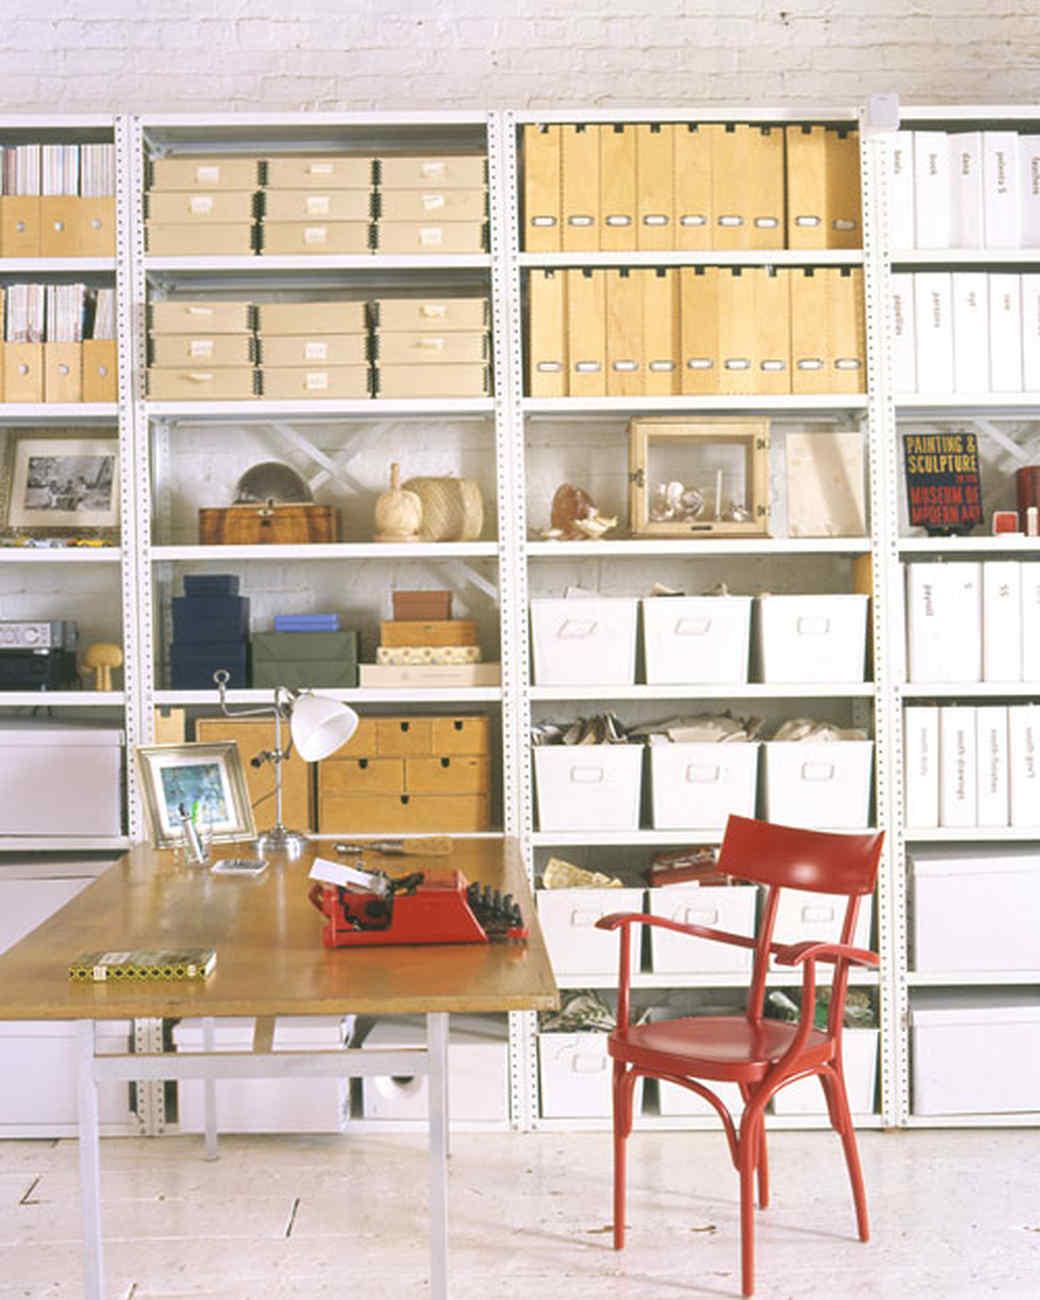 mpa103722_0908_office.jpg